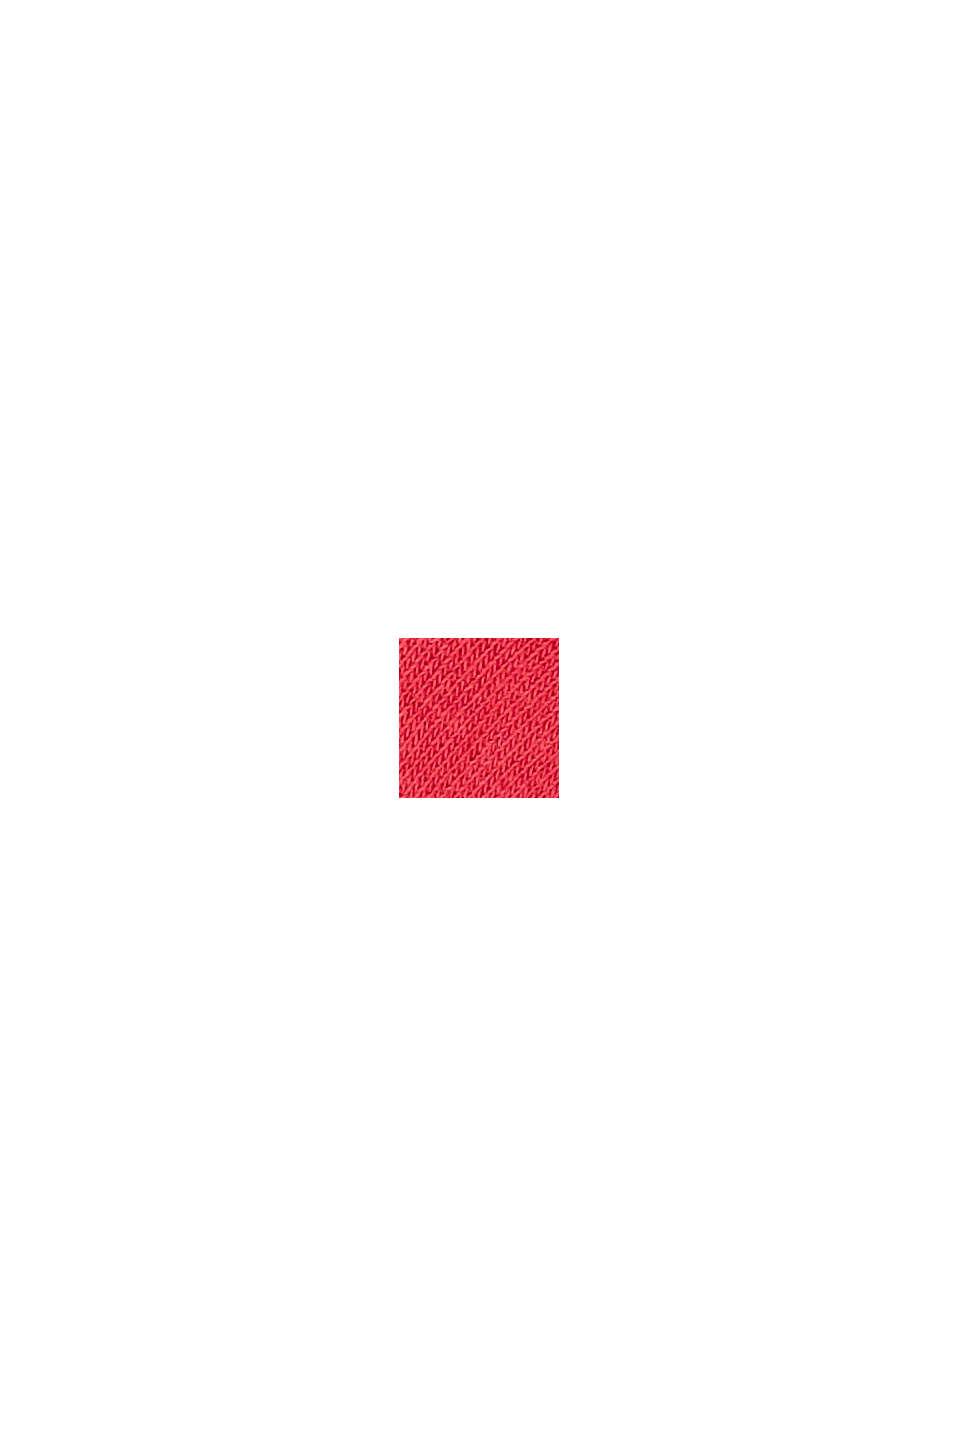 Socks, ROSE/RED, swatch